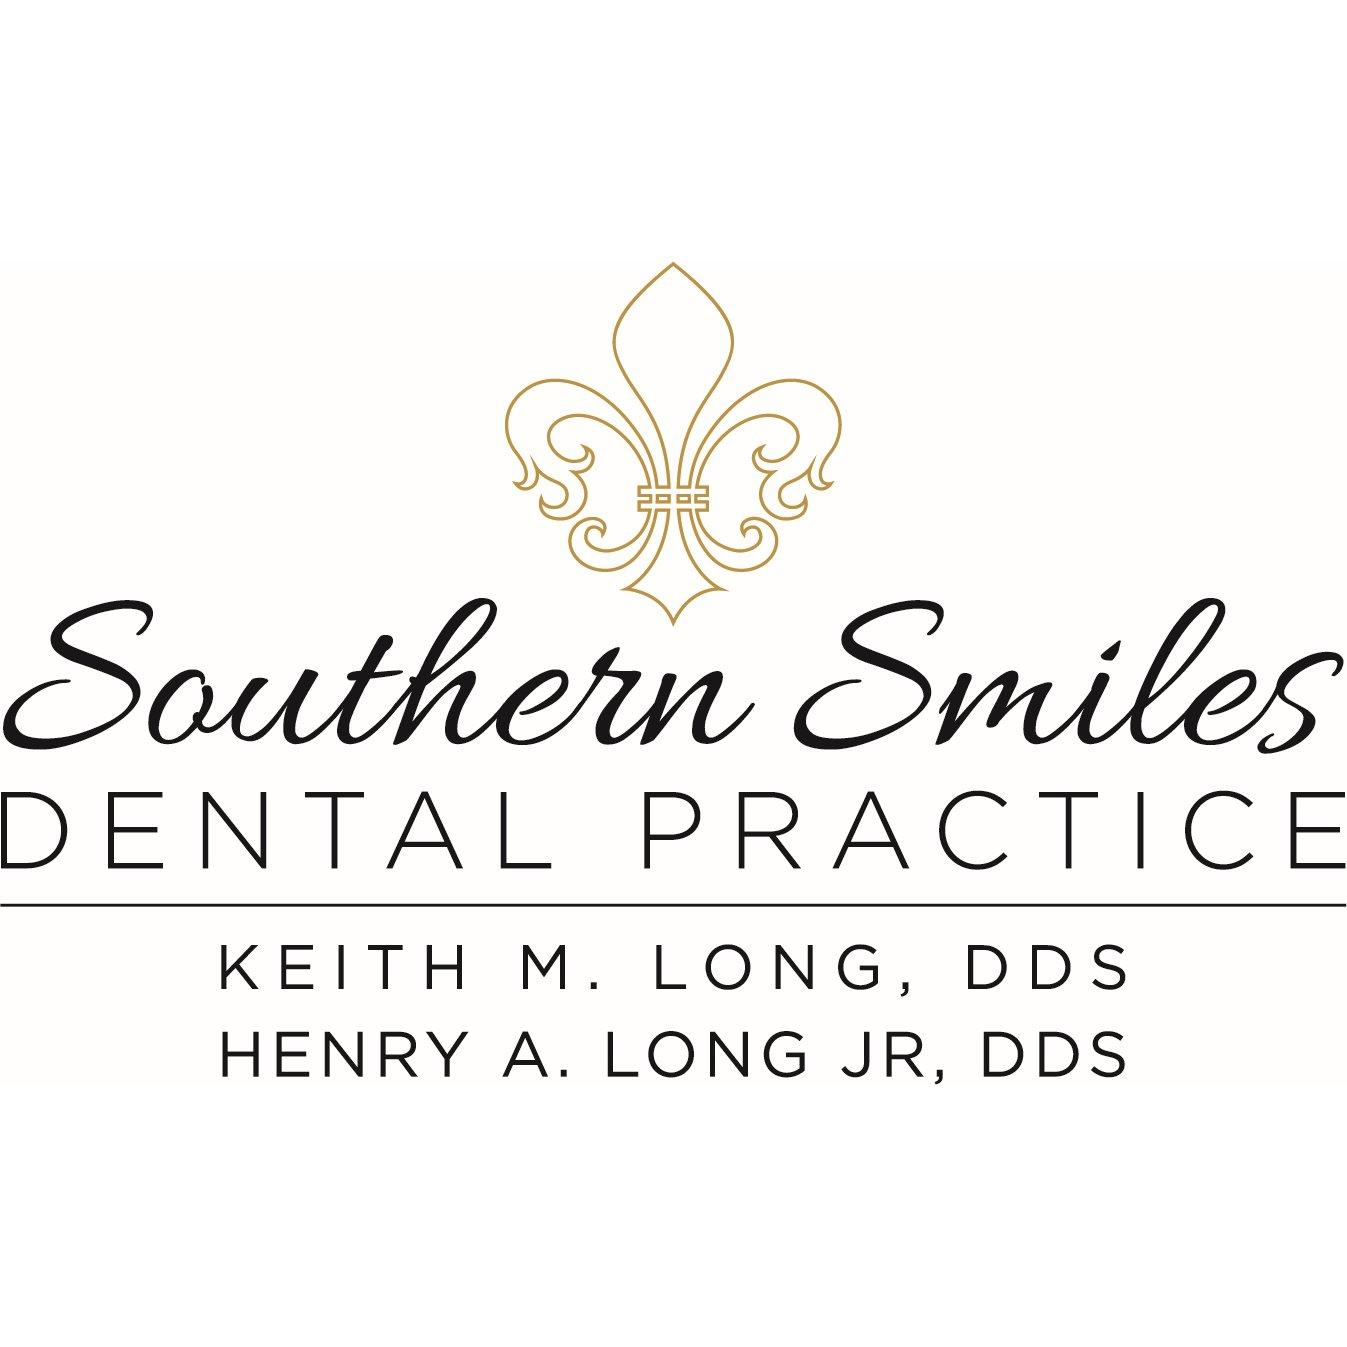 Southern Smiles Dental Practice image 0